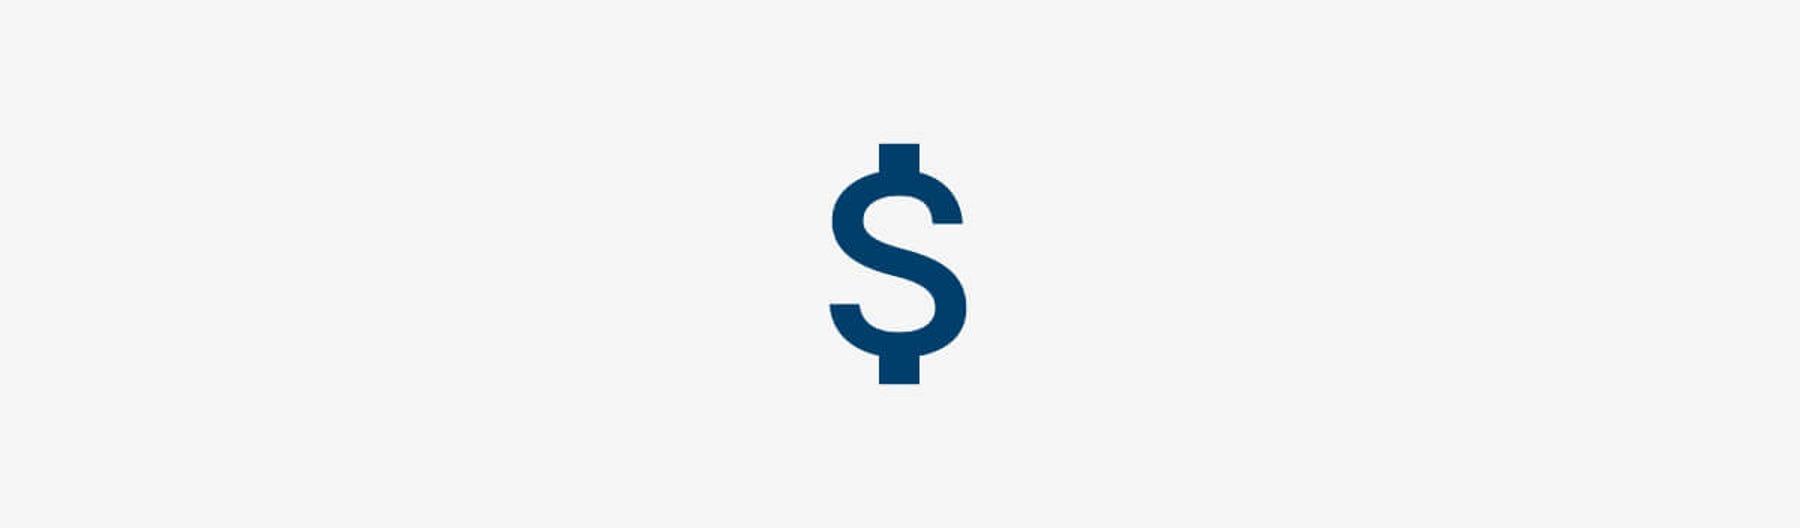 Trade-In Program | Best Buy Canada